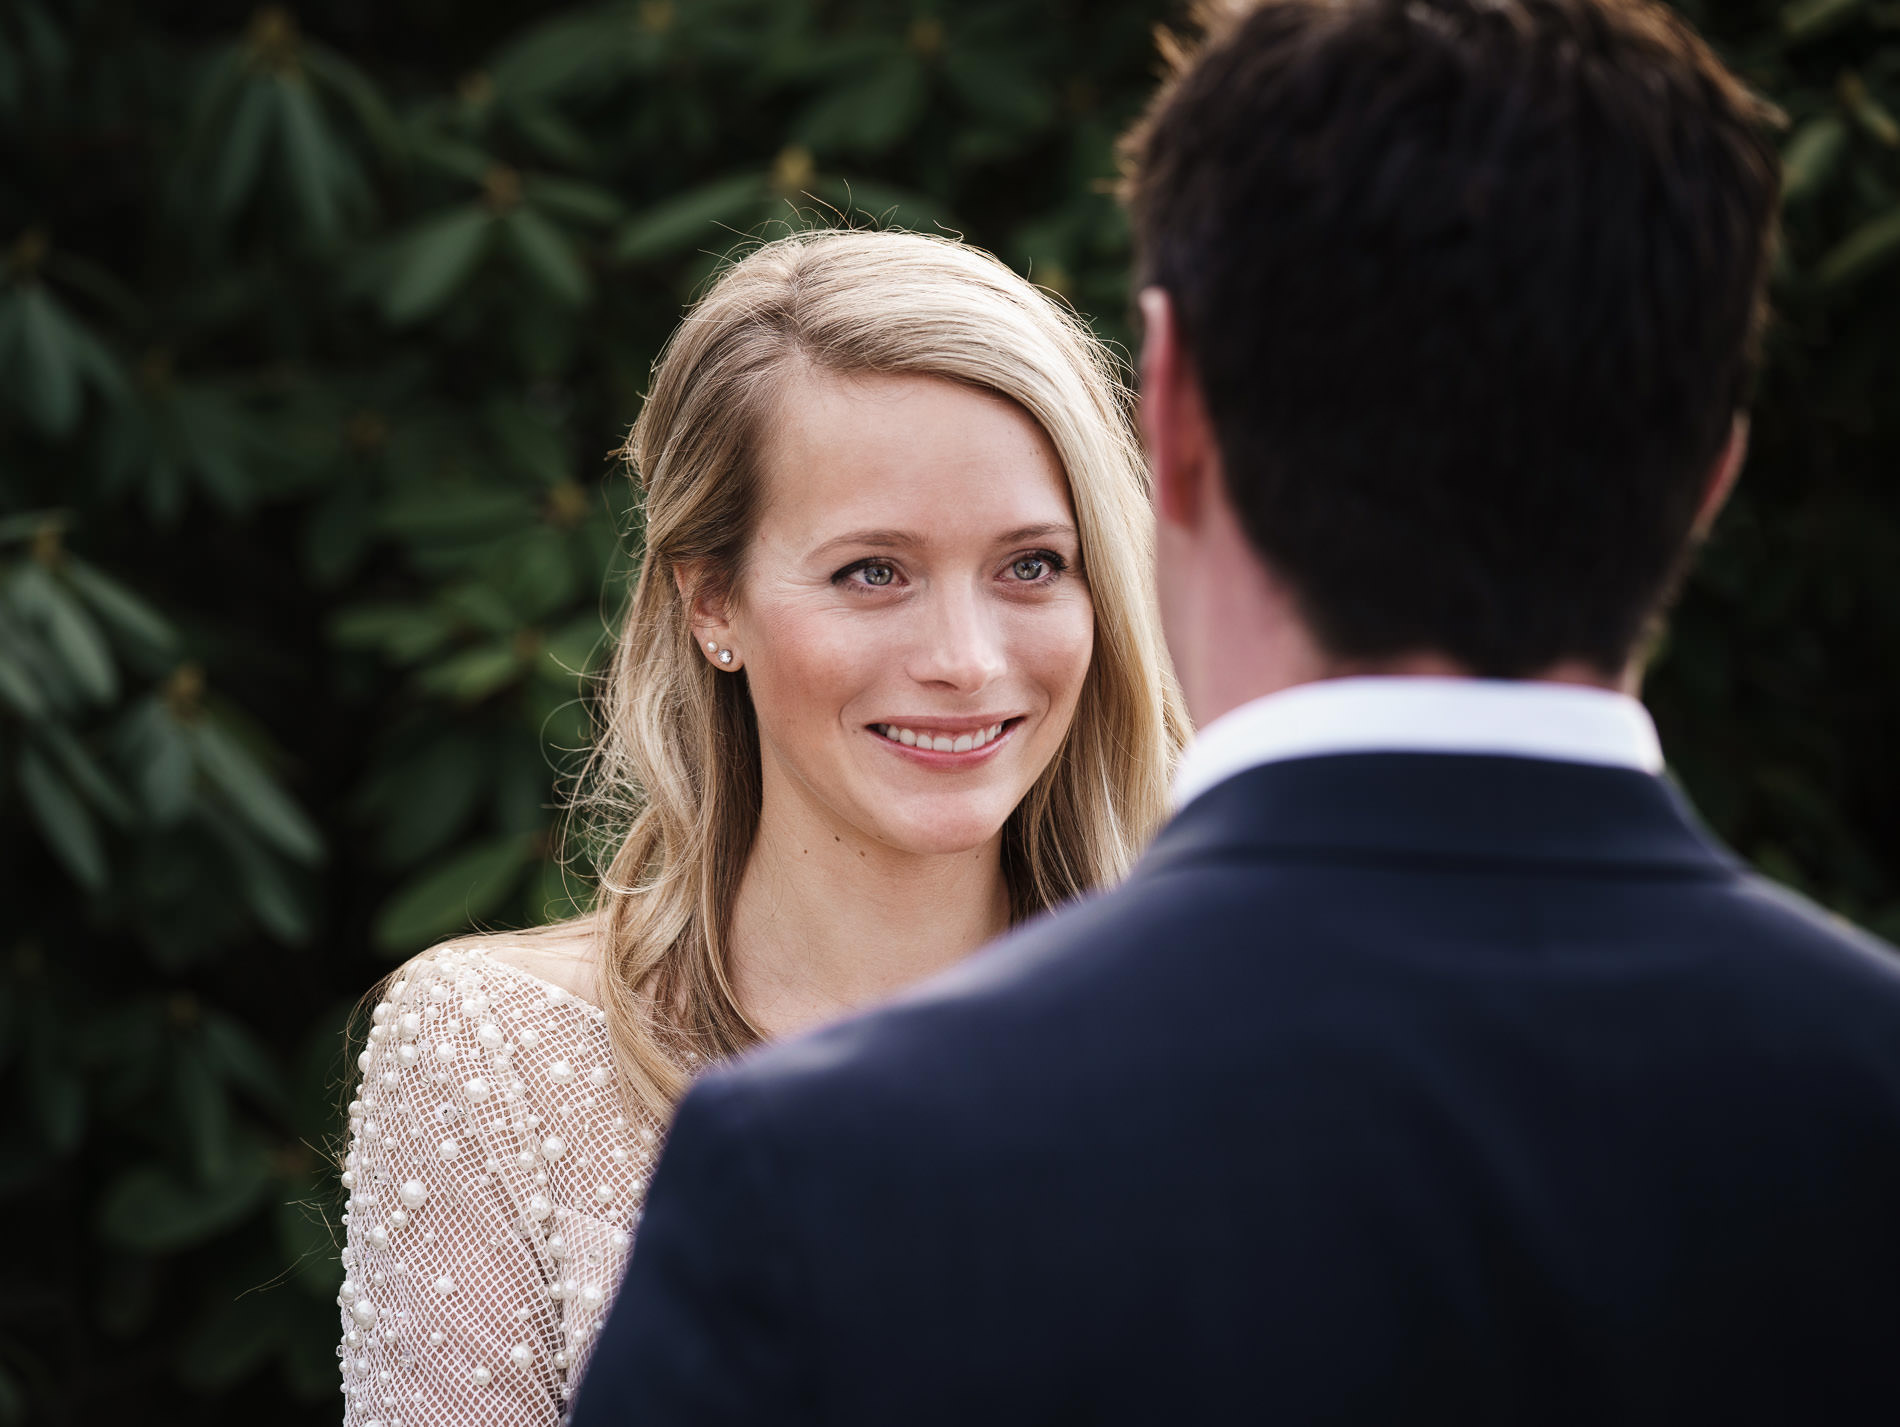 Braut Eheversprechen